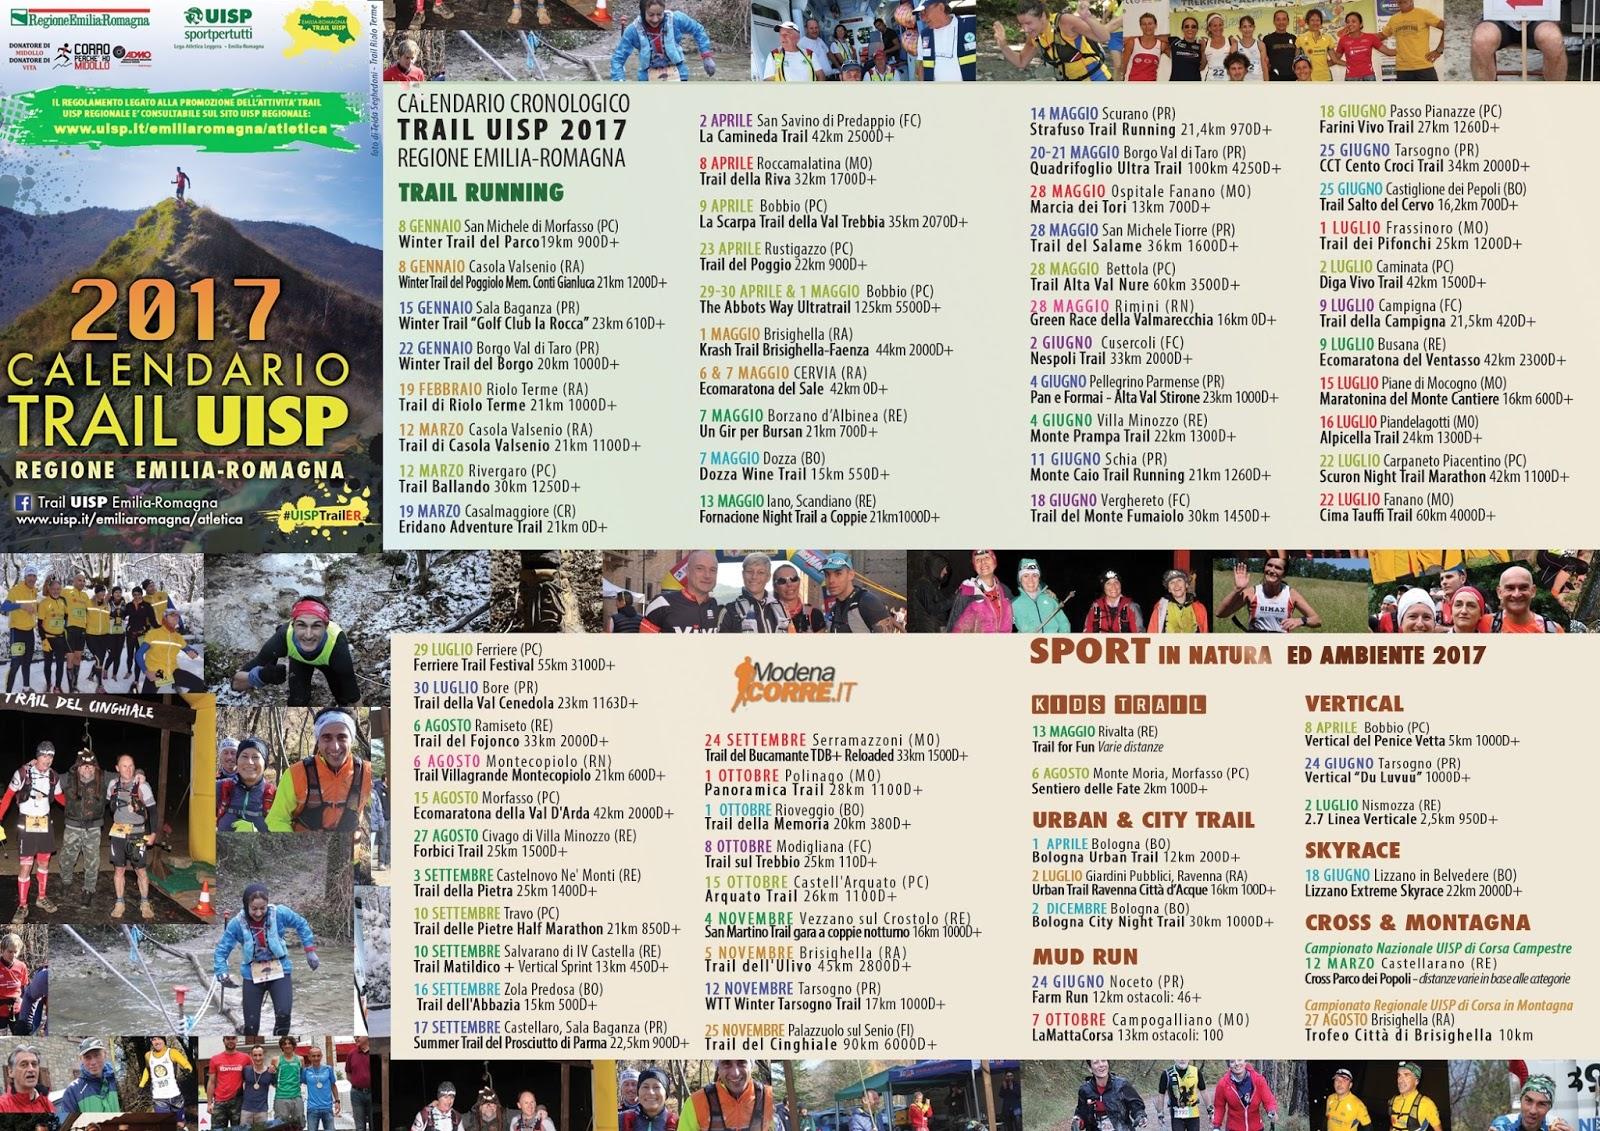 Giuseppe Rosati Calendario.Atletica Corriferrara A S D Calendario Trail 2017 Emilia